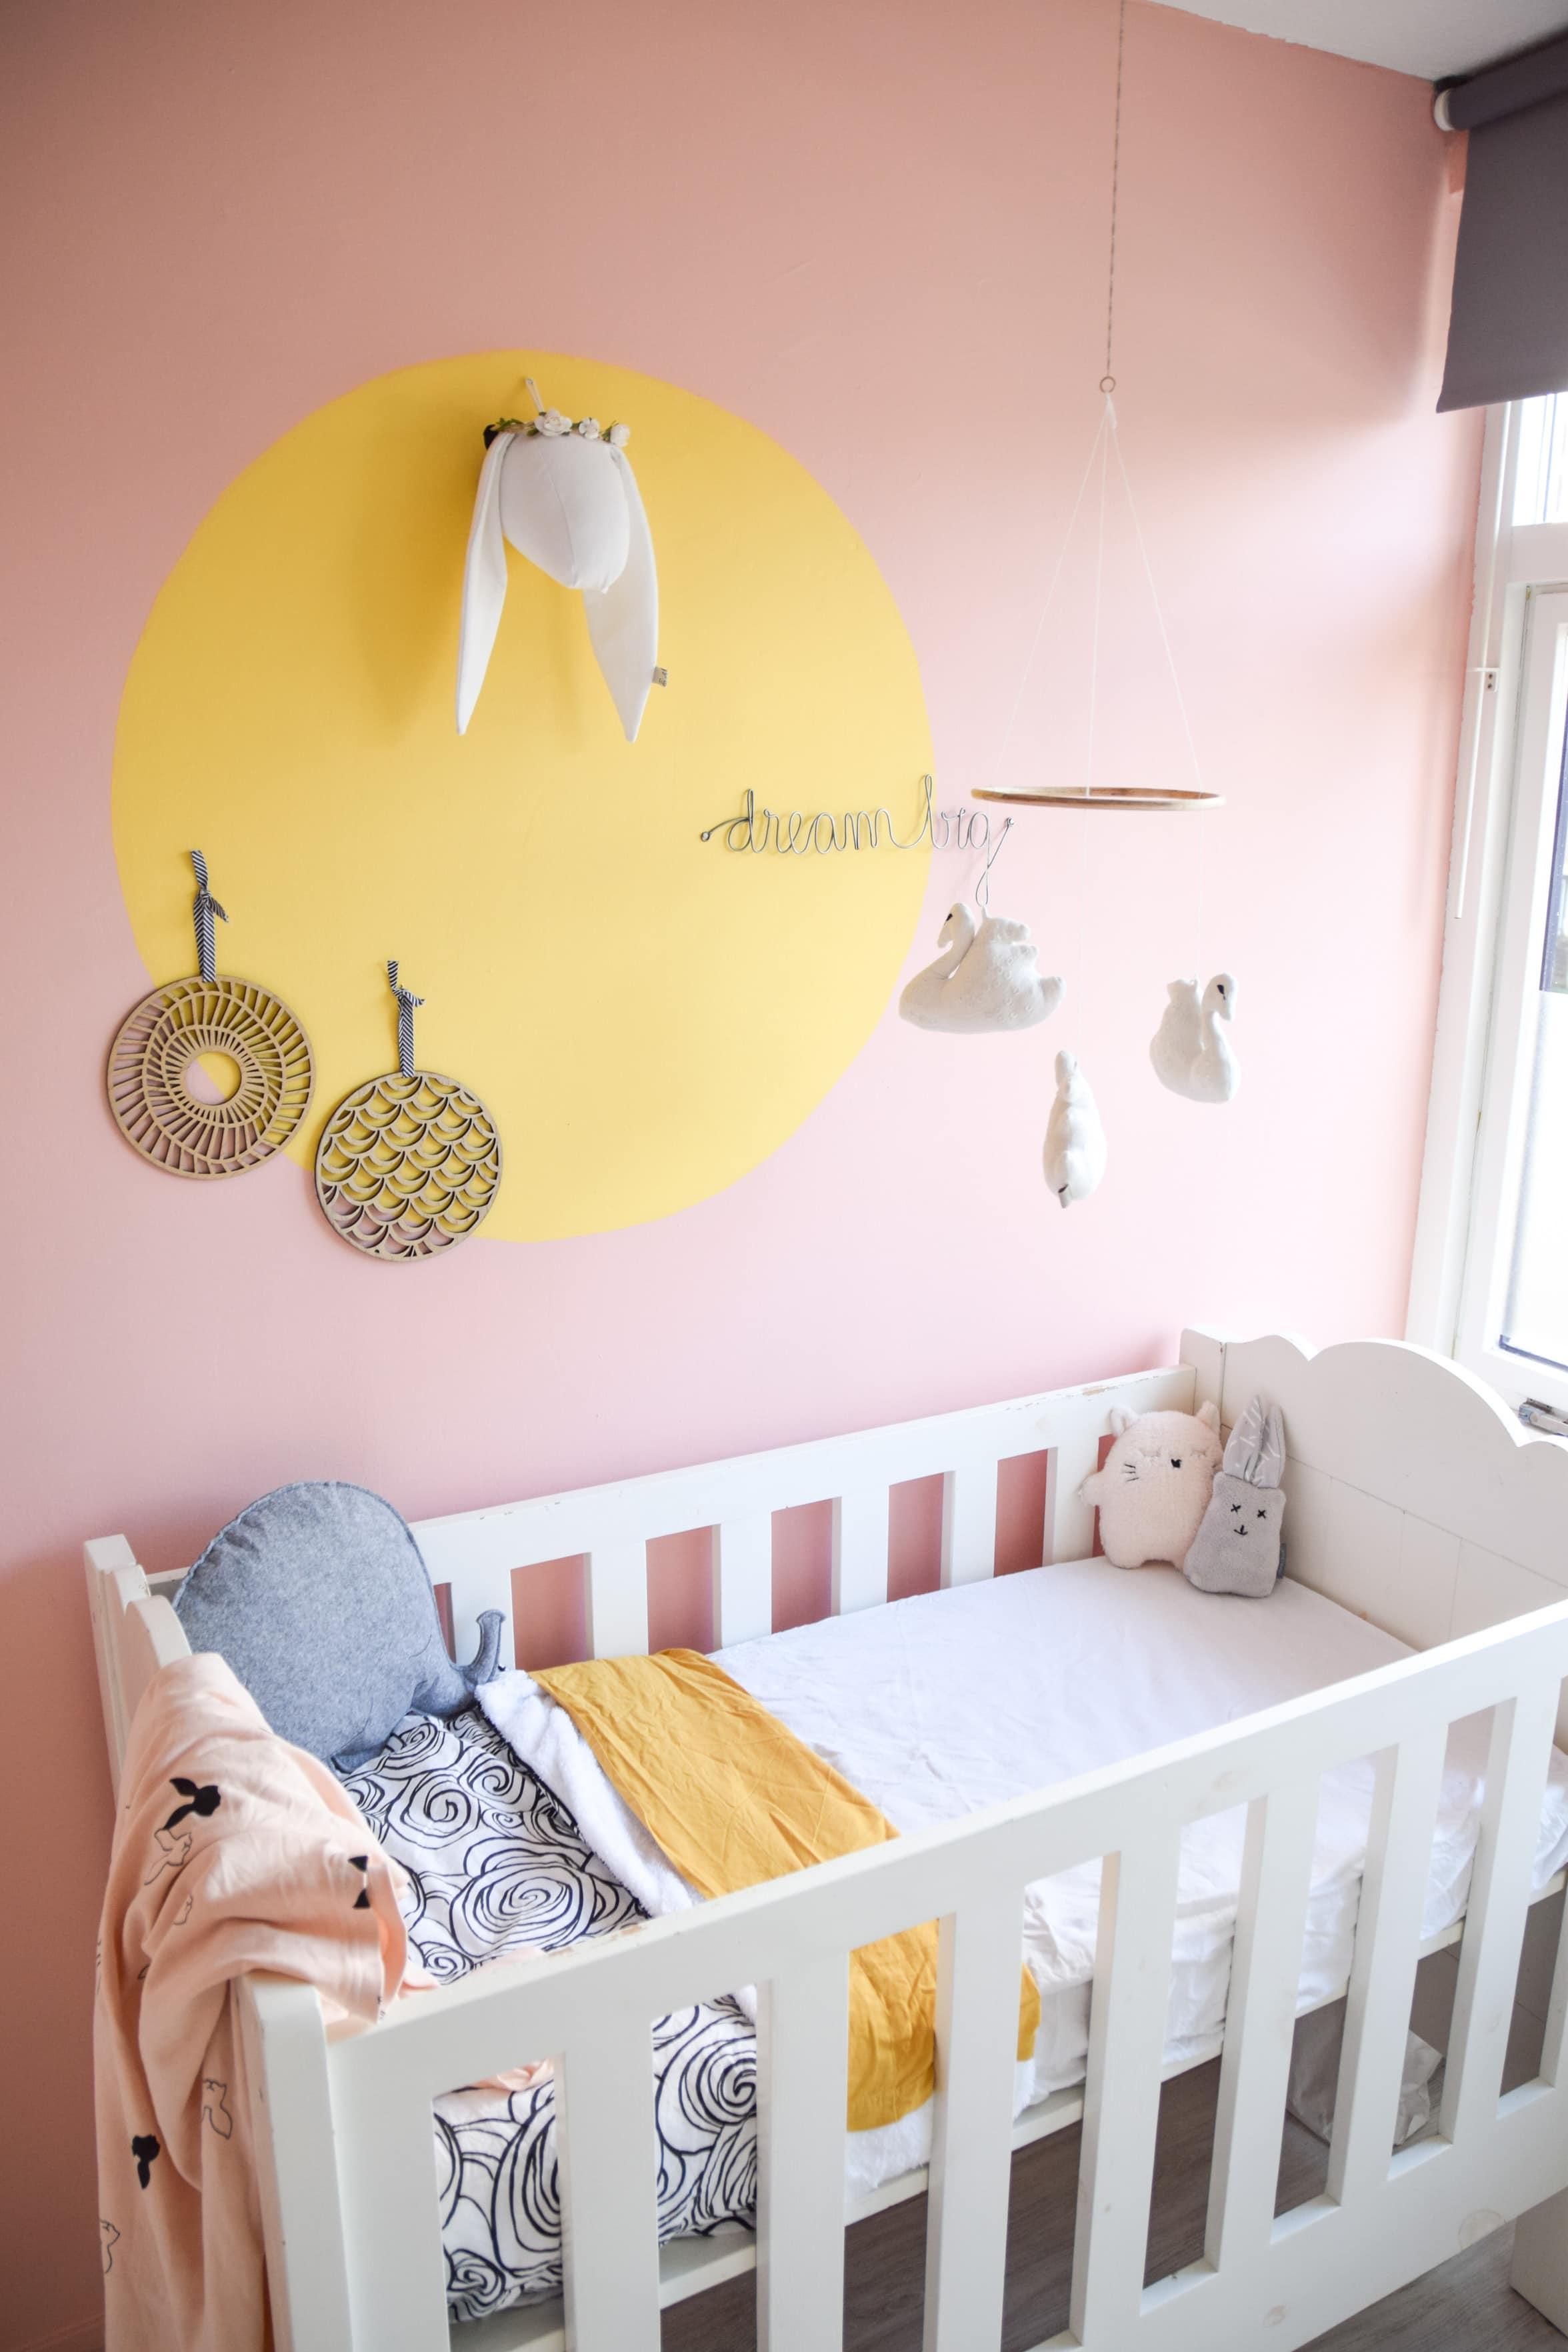 fairf eco verf babykamer